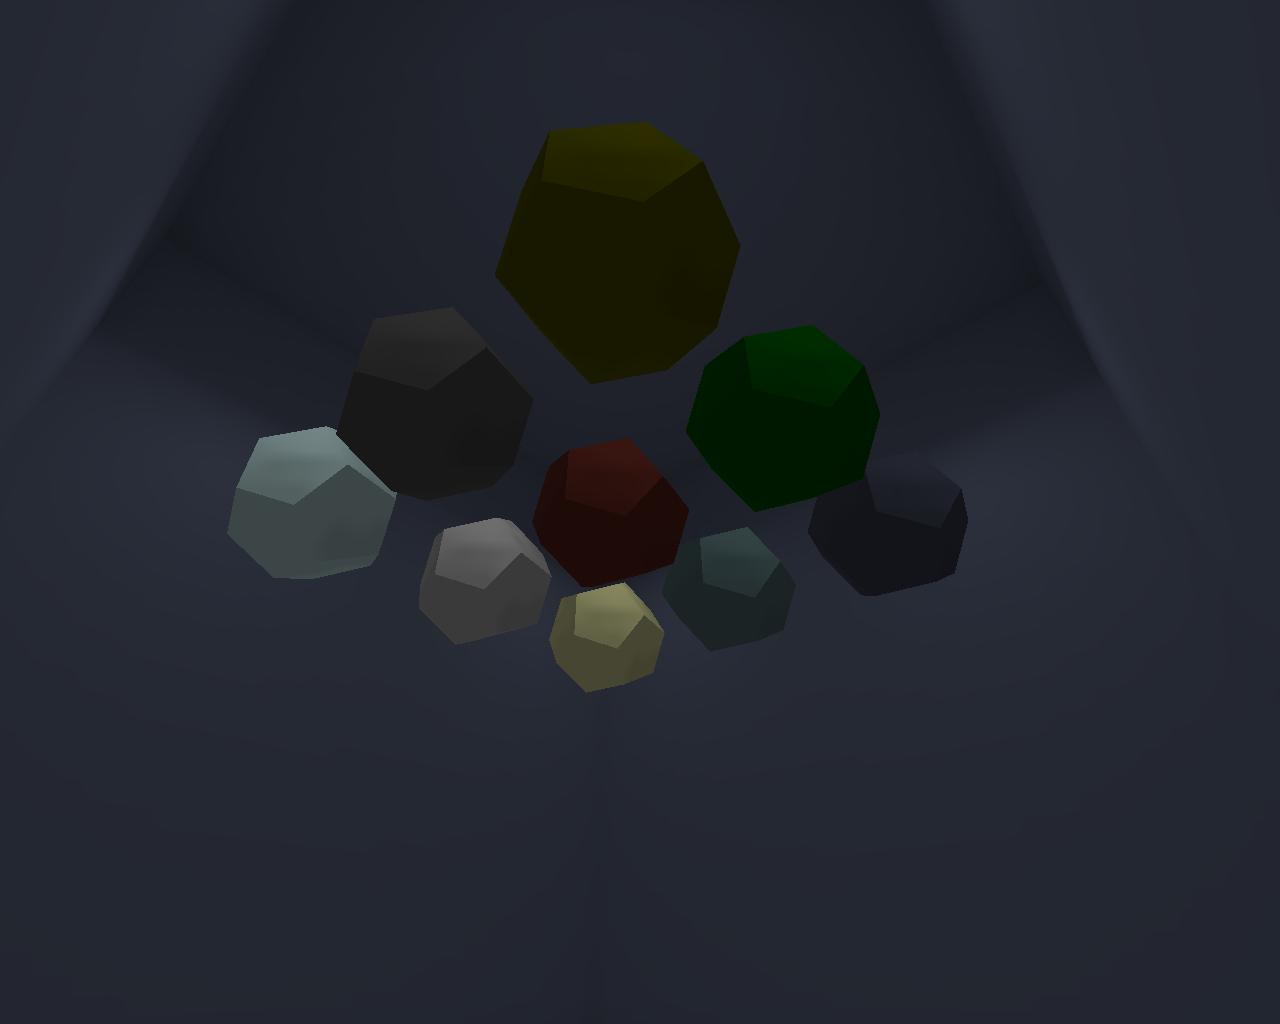 ln_cube0003.png - Half-Life ln_cube, додэкаэдр